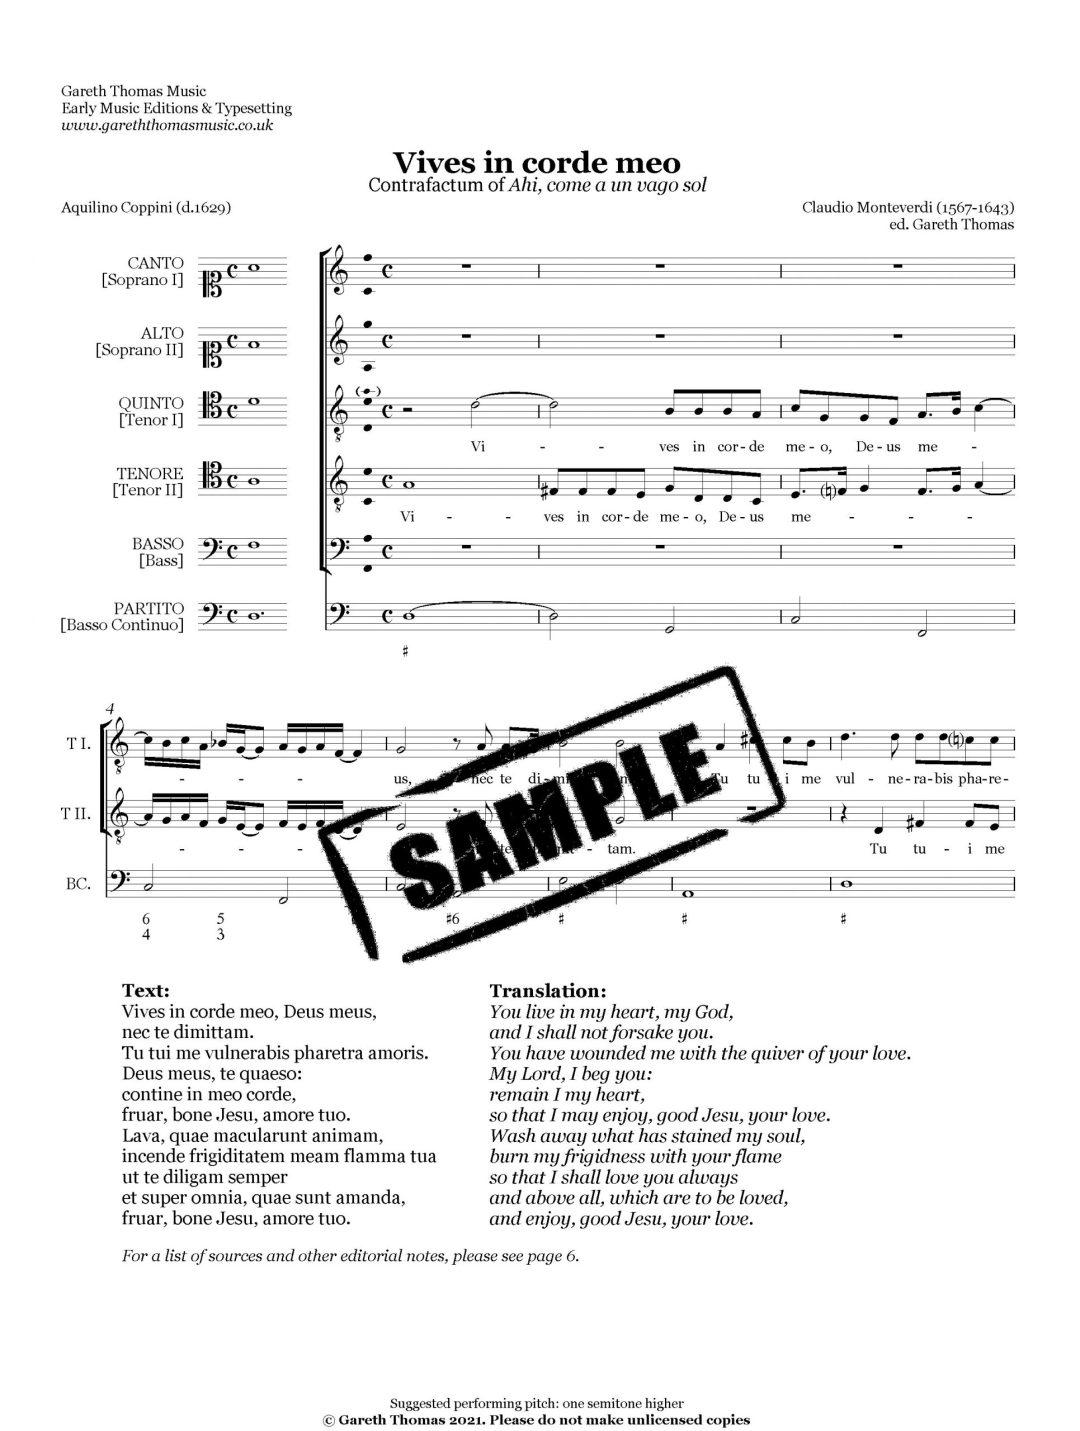 Claudio Monteverdi - Vives in corde meo image